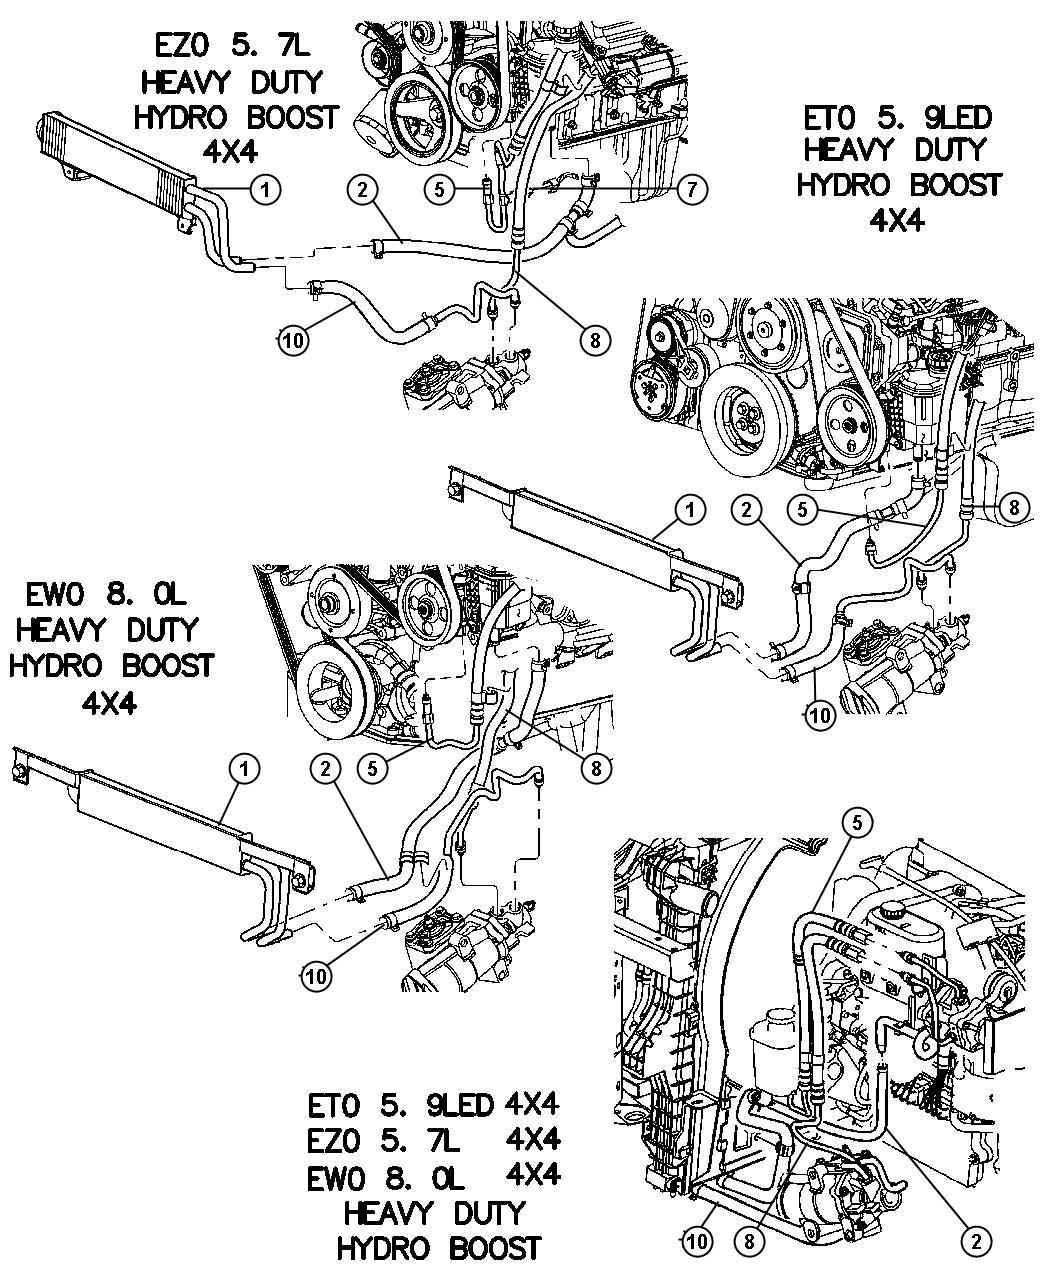 Dodge Ram Hoses Power Steering 4 Wheel Drive